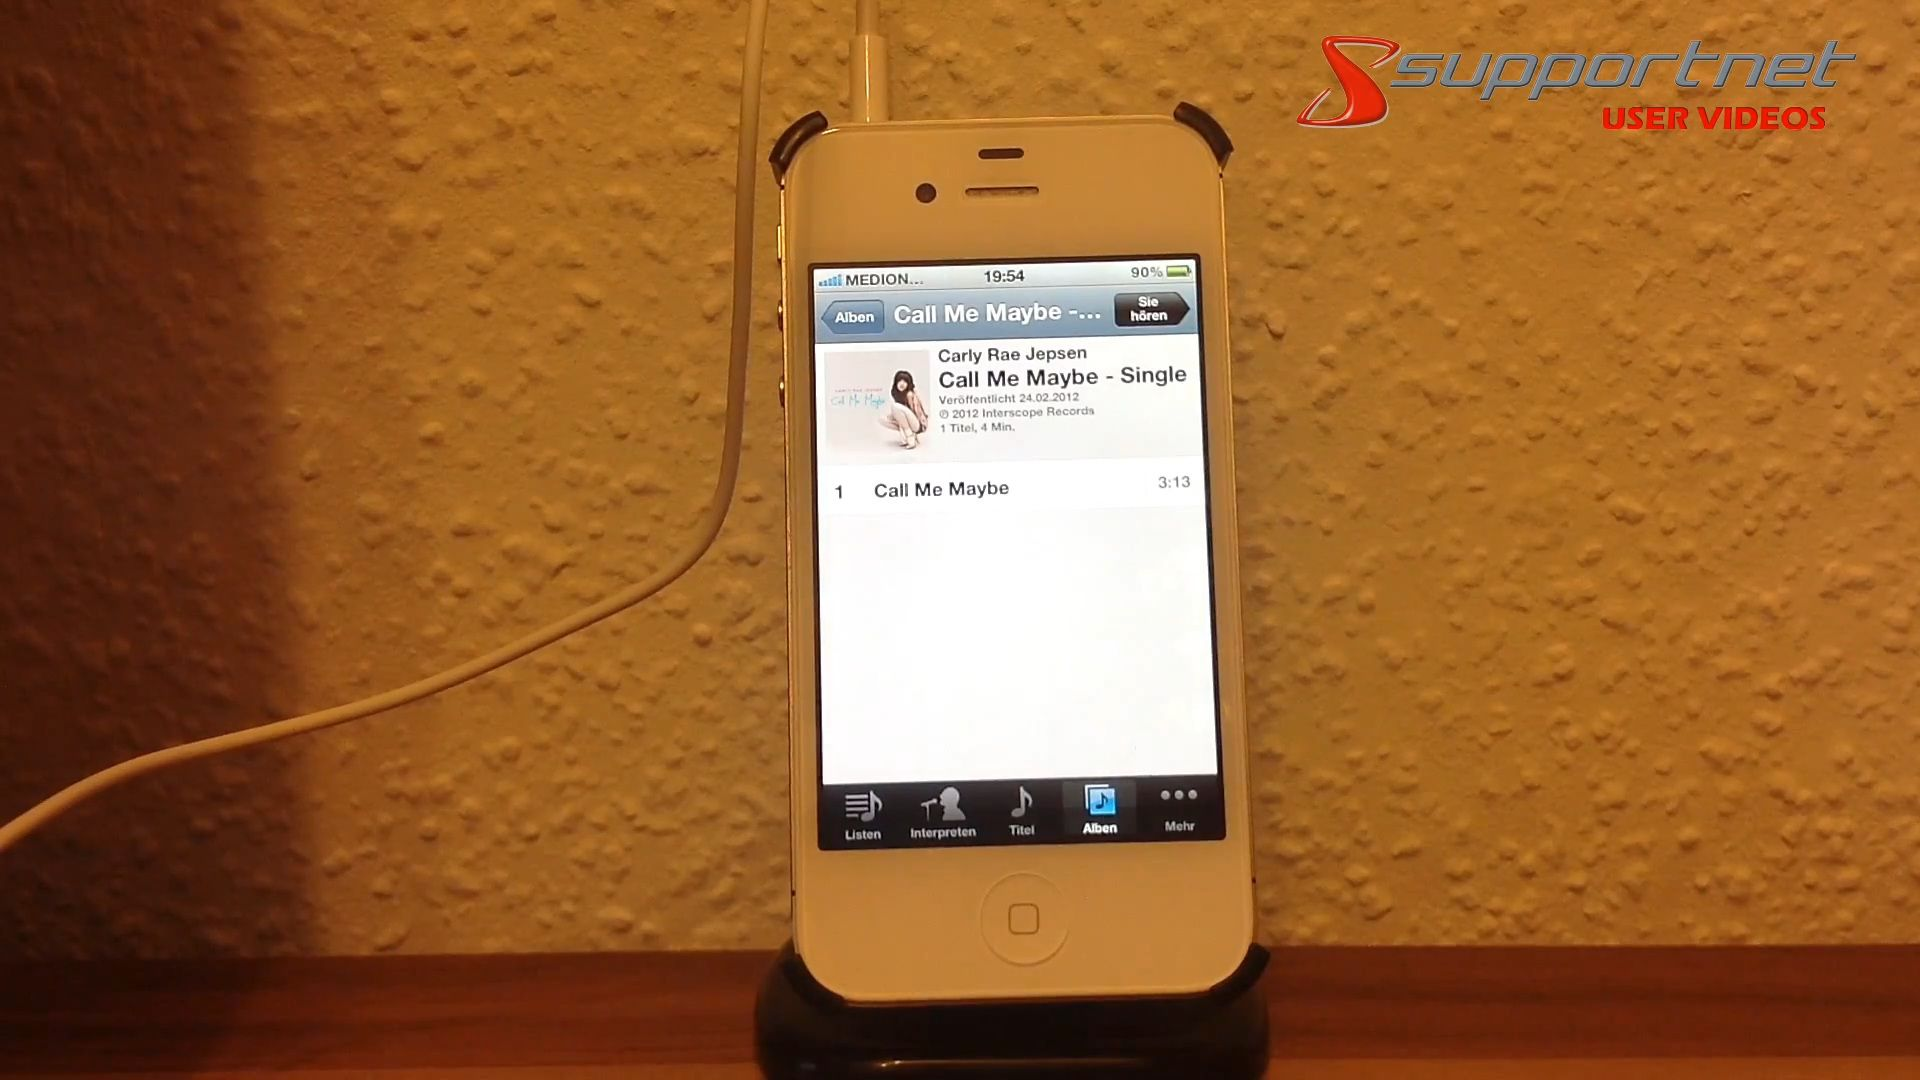 iphone-4-kopfhoerer-bedienung-user-80.jpg?nocache=1346748004985